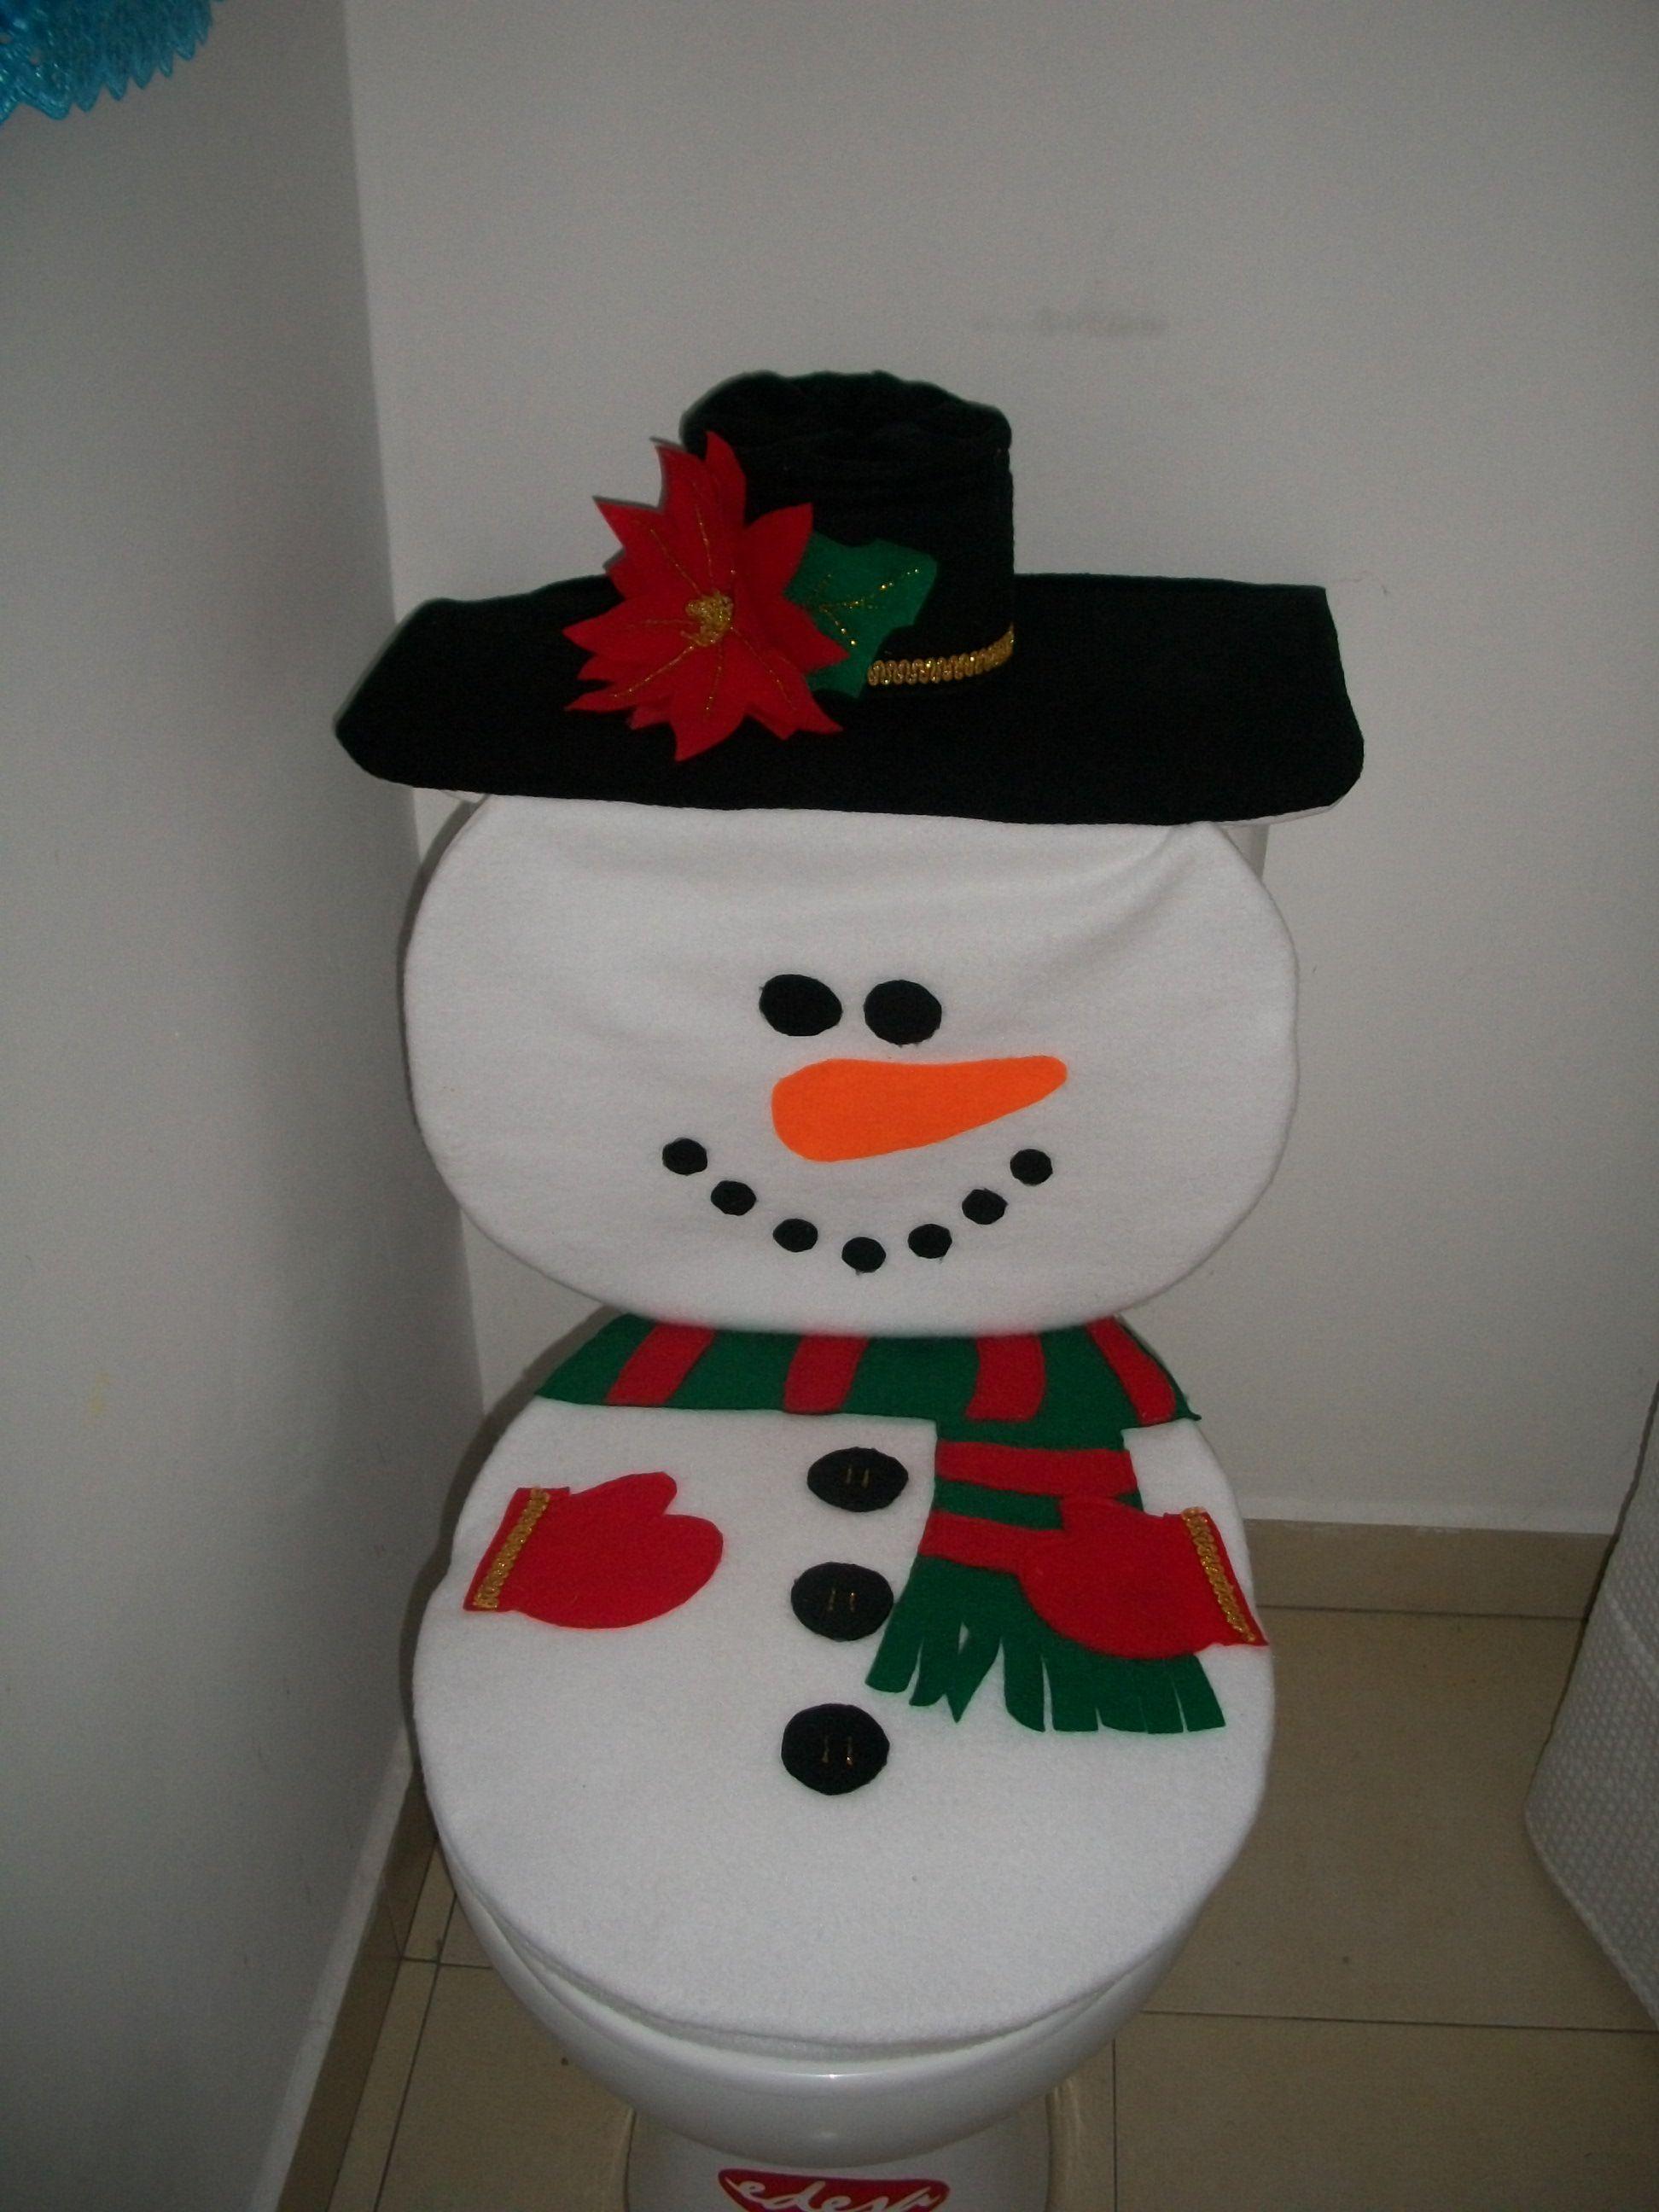 Juego de baño navideño snowman  Juegos de baño navideños ...